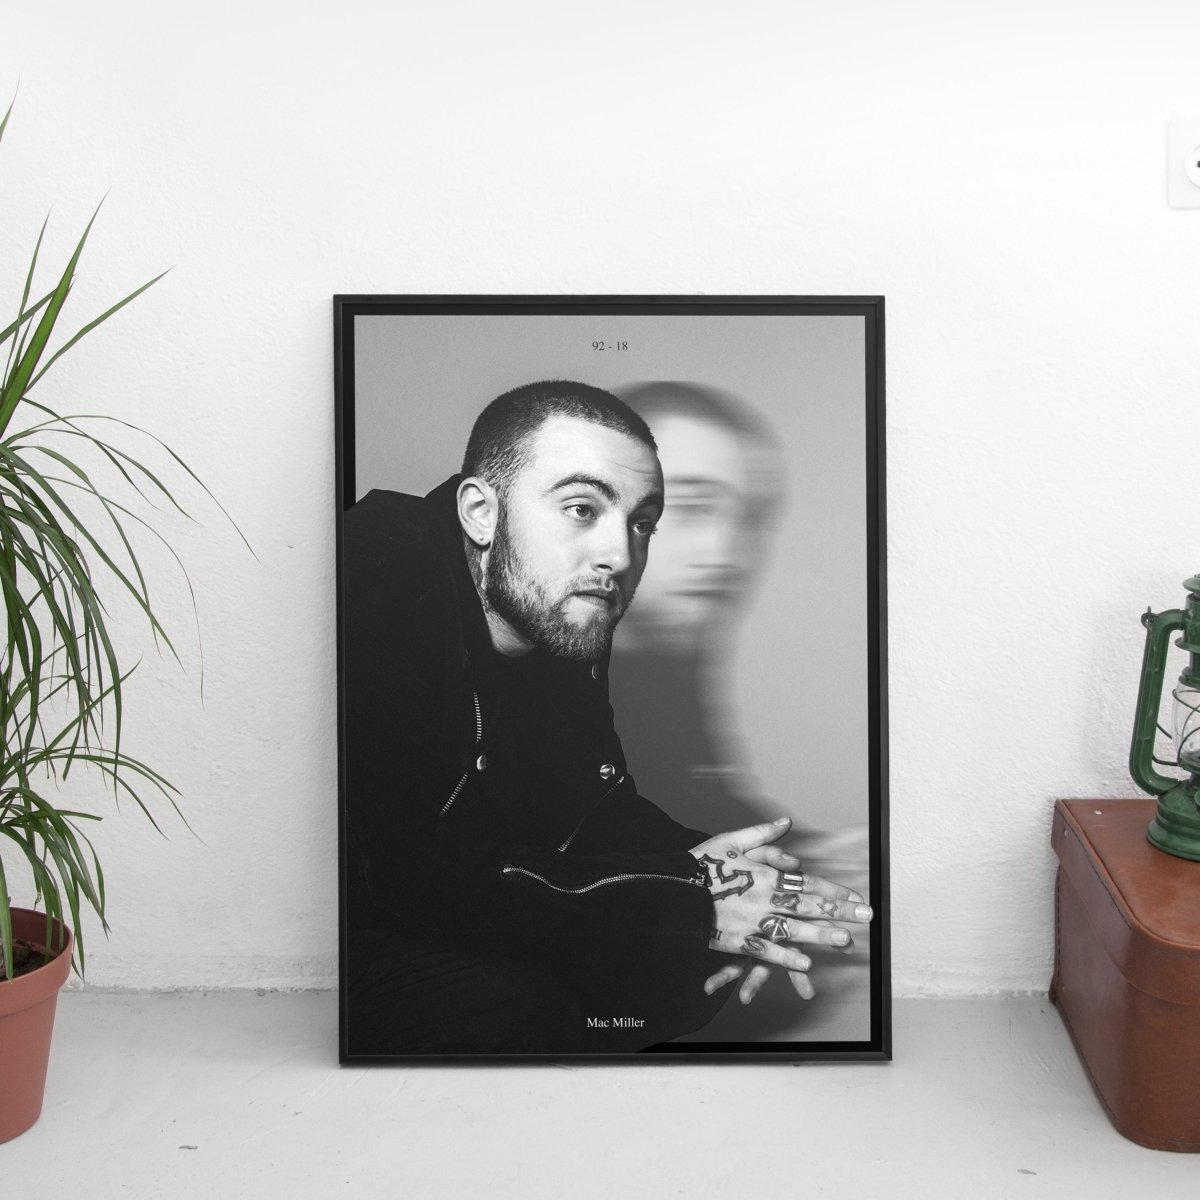 Mac Miller - 92-18 Poster